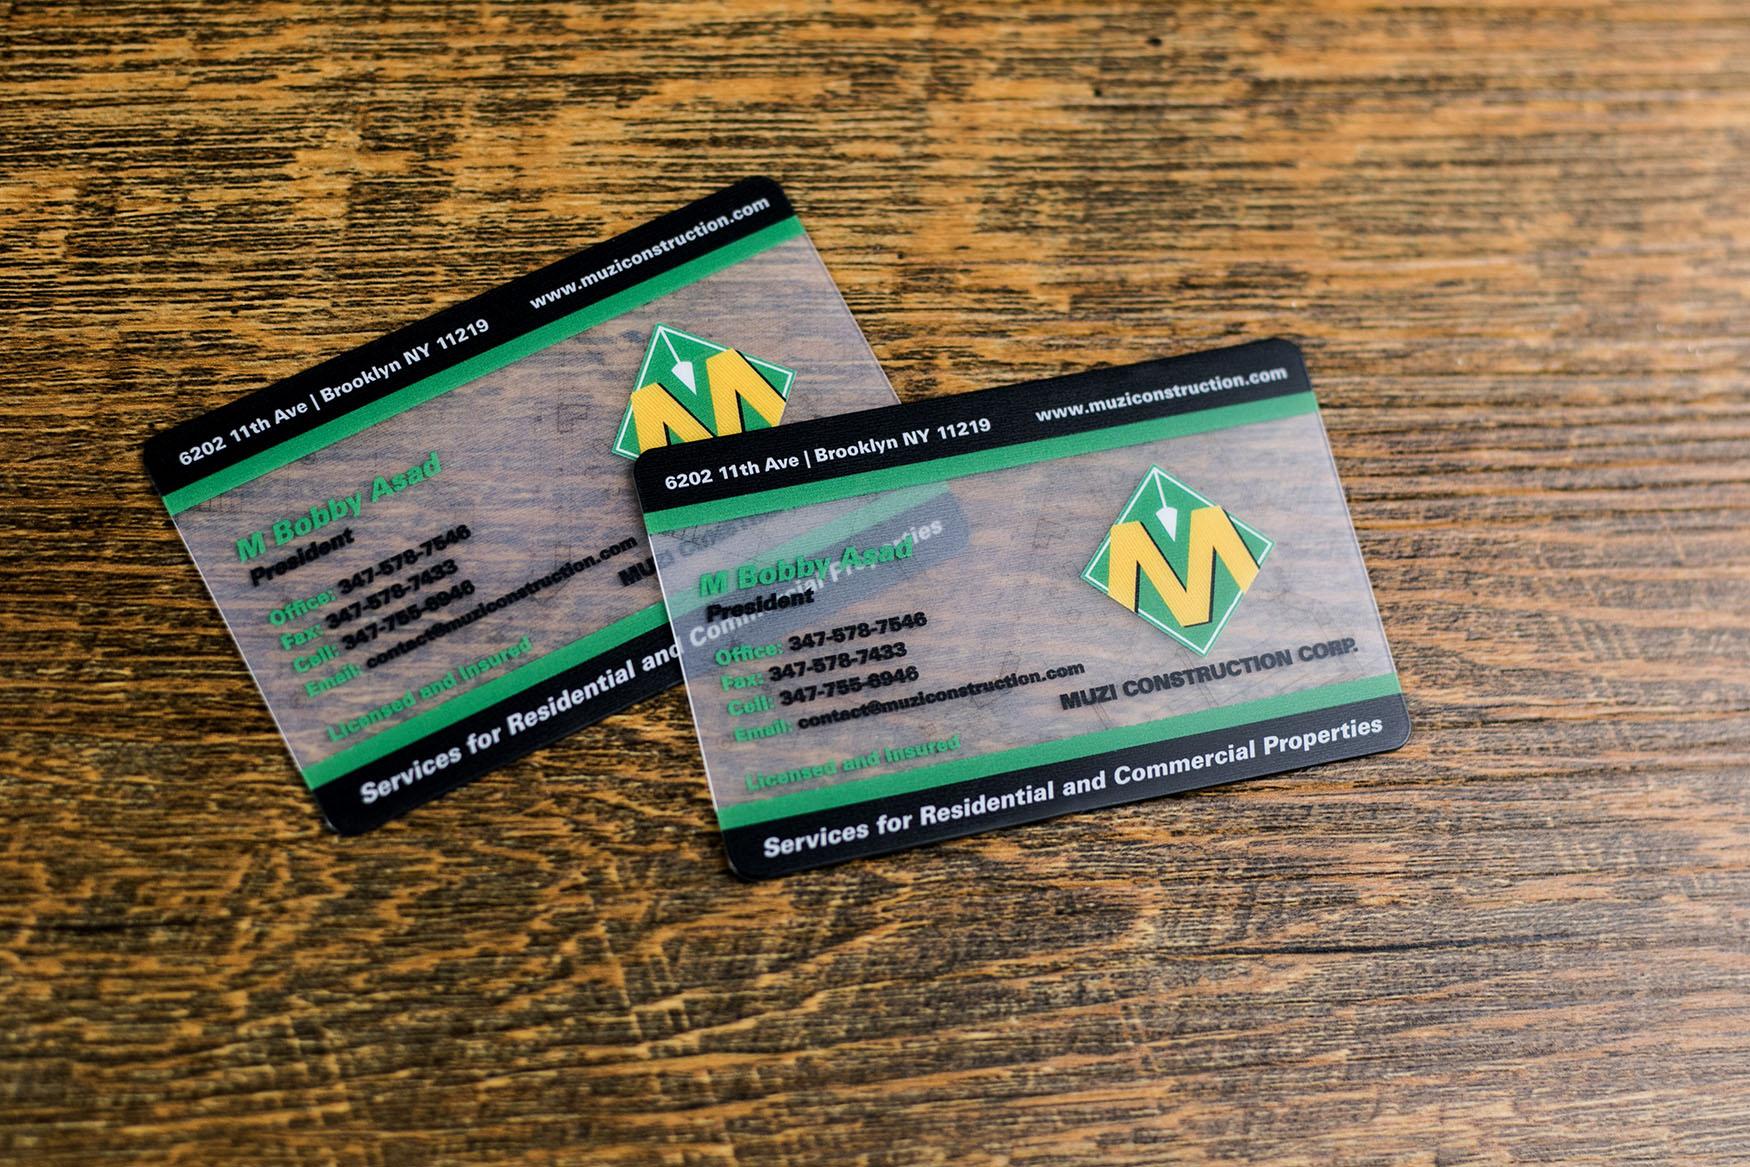 Muzi Construction Corp Business Cards